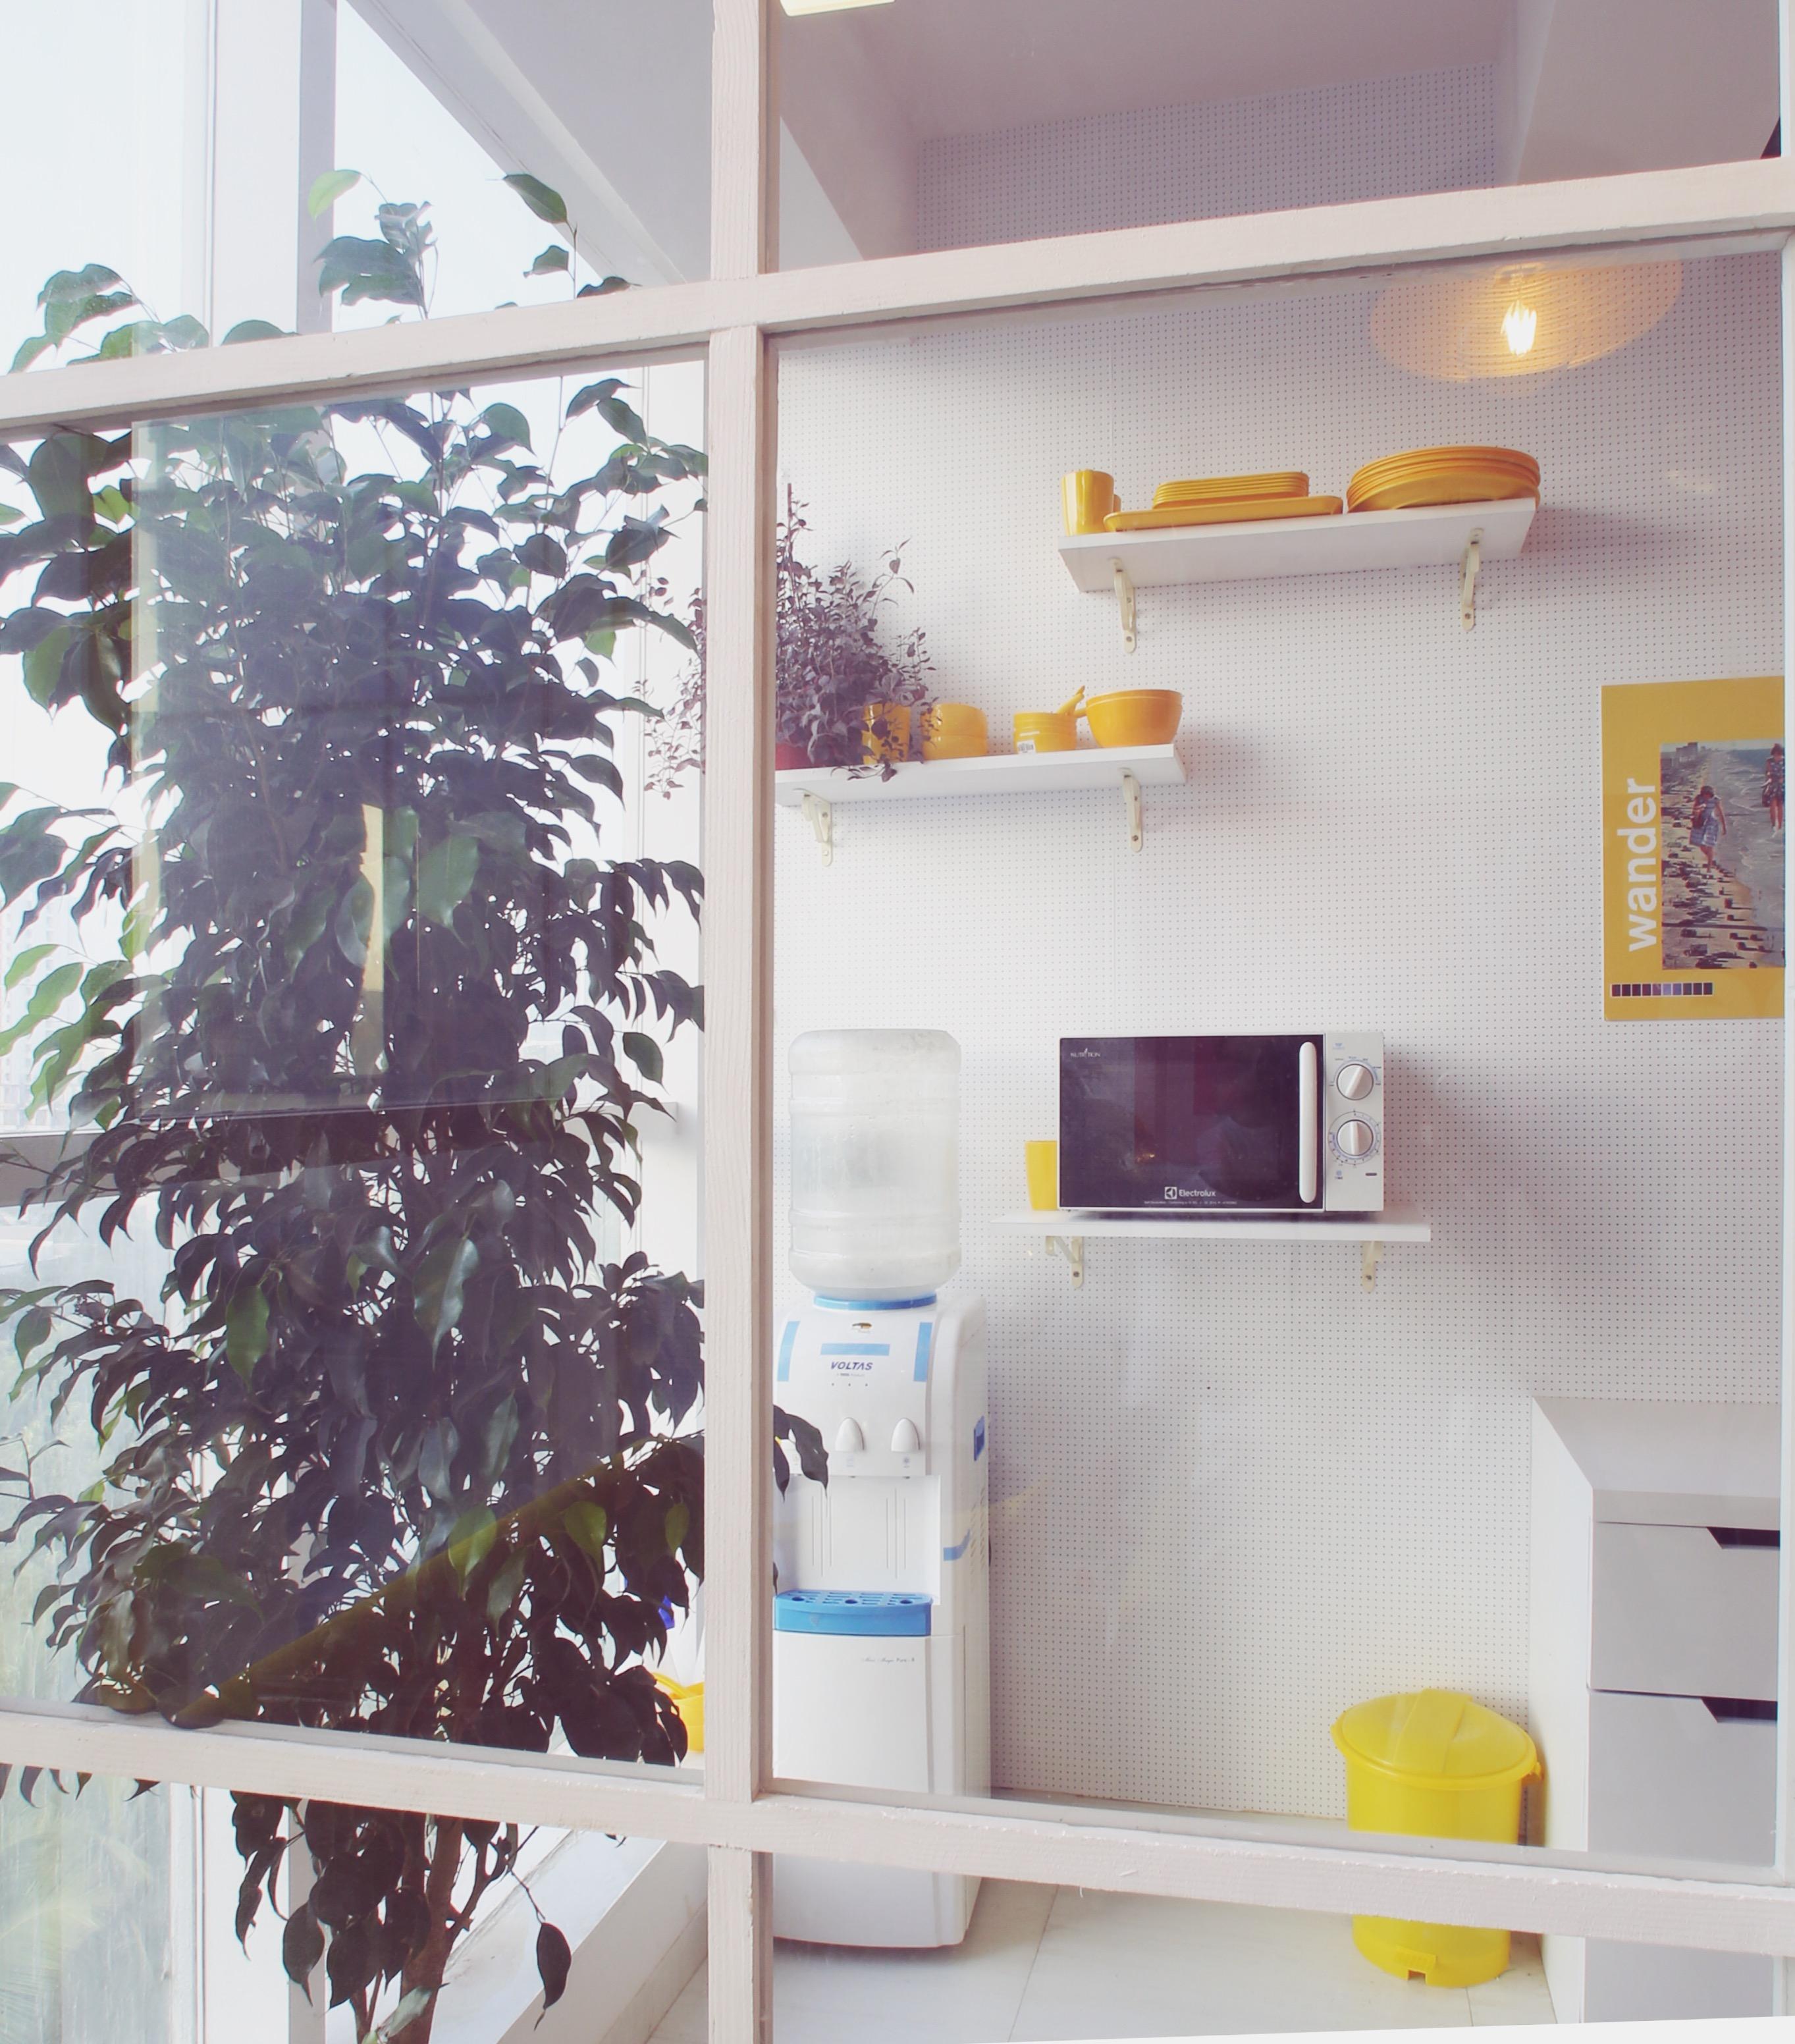 The office breakroom